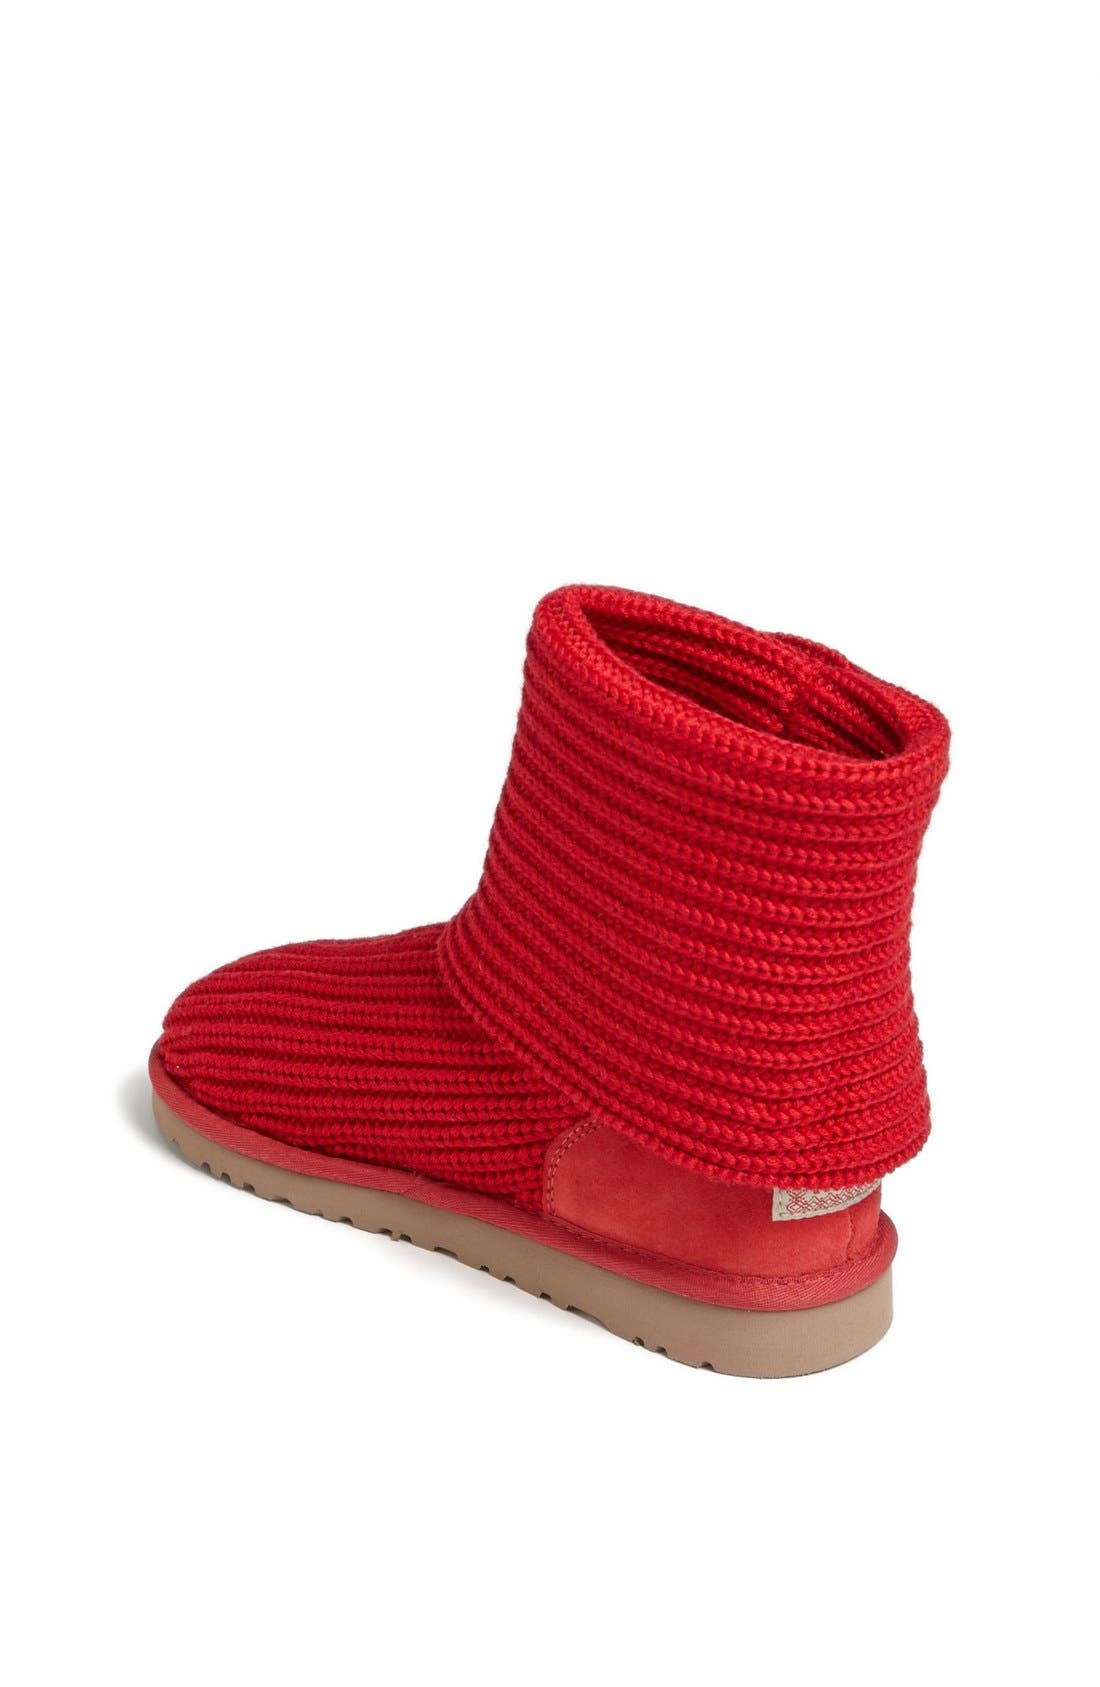 Alternate Image 2  - UGG® 'Cardy' Crochet Boot (Toddler, Little Kid & Big Kid)